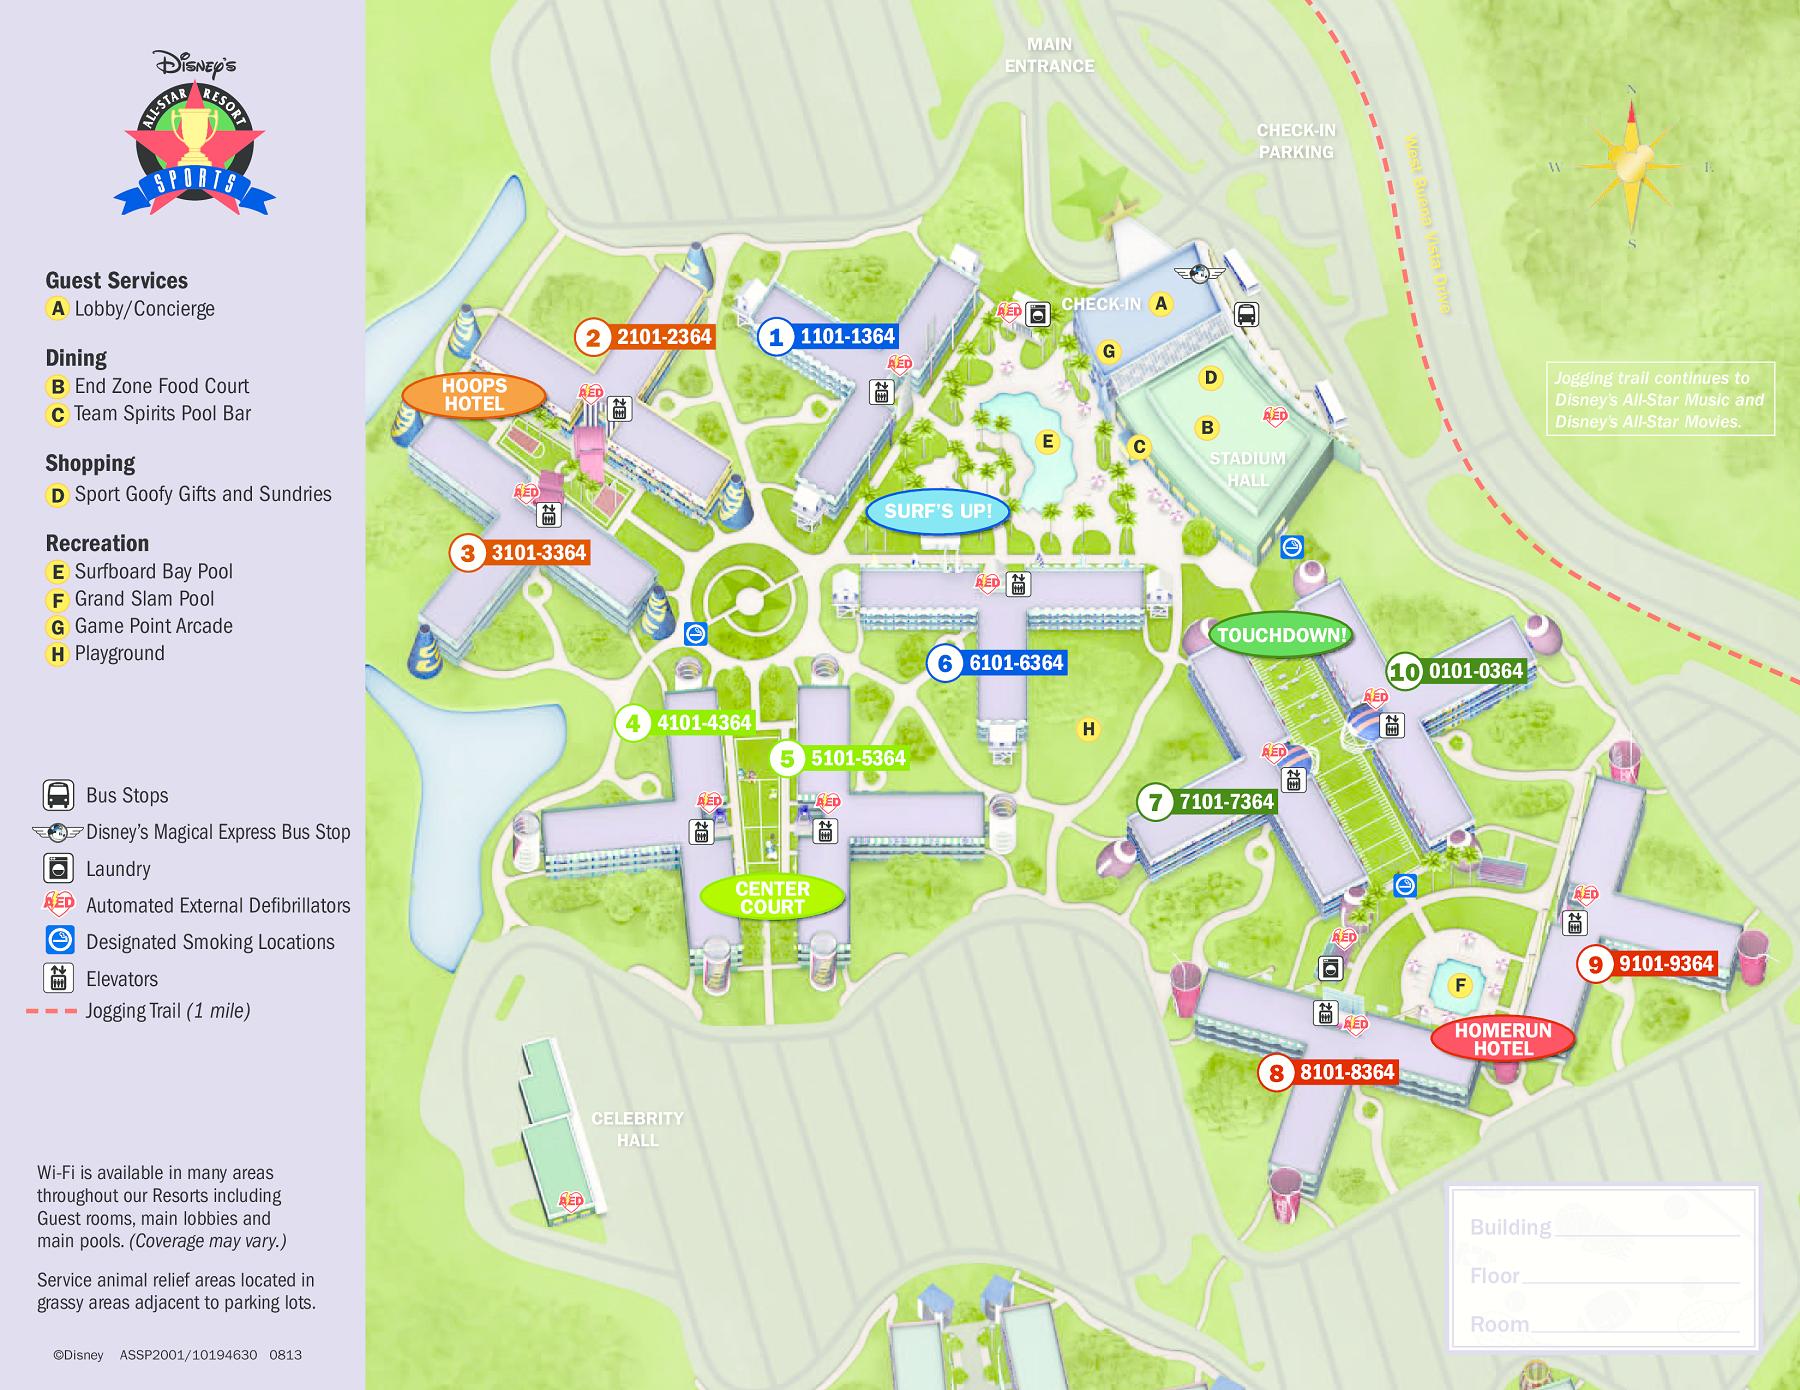 All Star Music Resort Map Walt Disney World Maps | WDW Planning